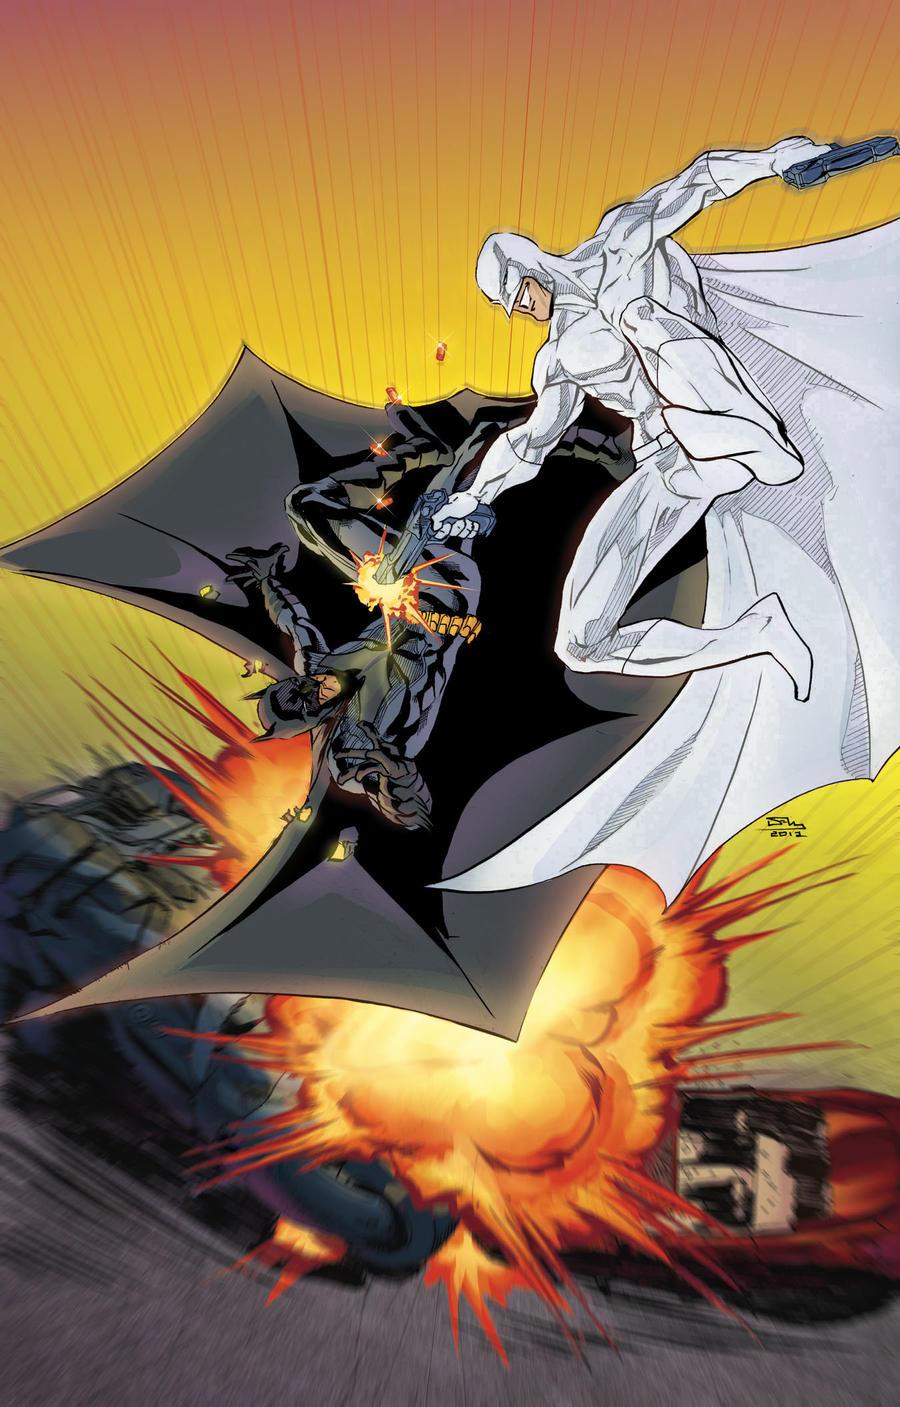 Batman vs Nemesis TLID by thecreatorhd